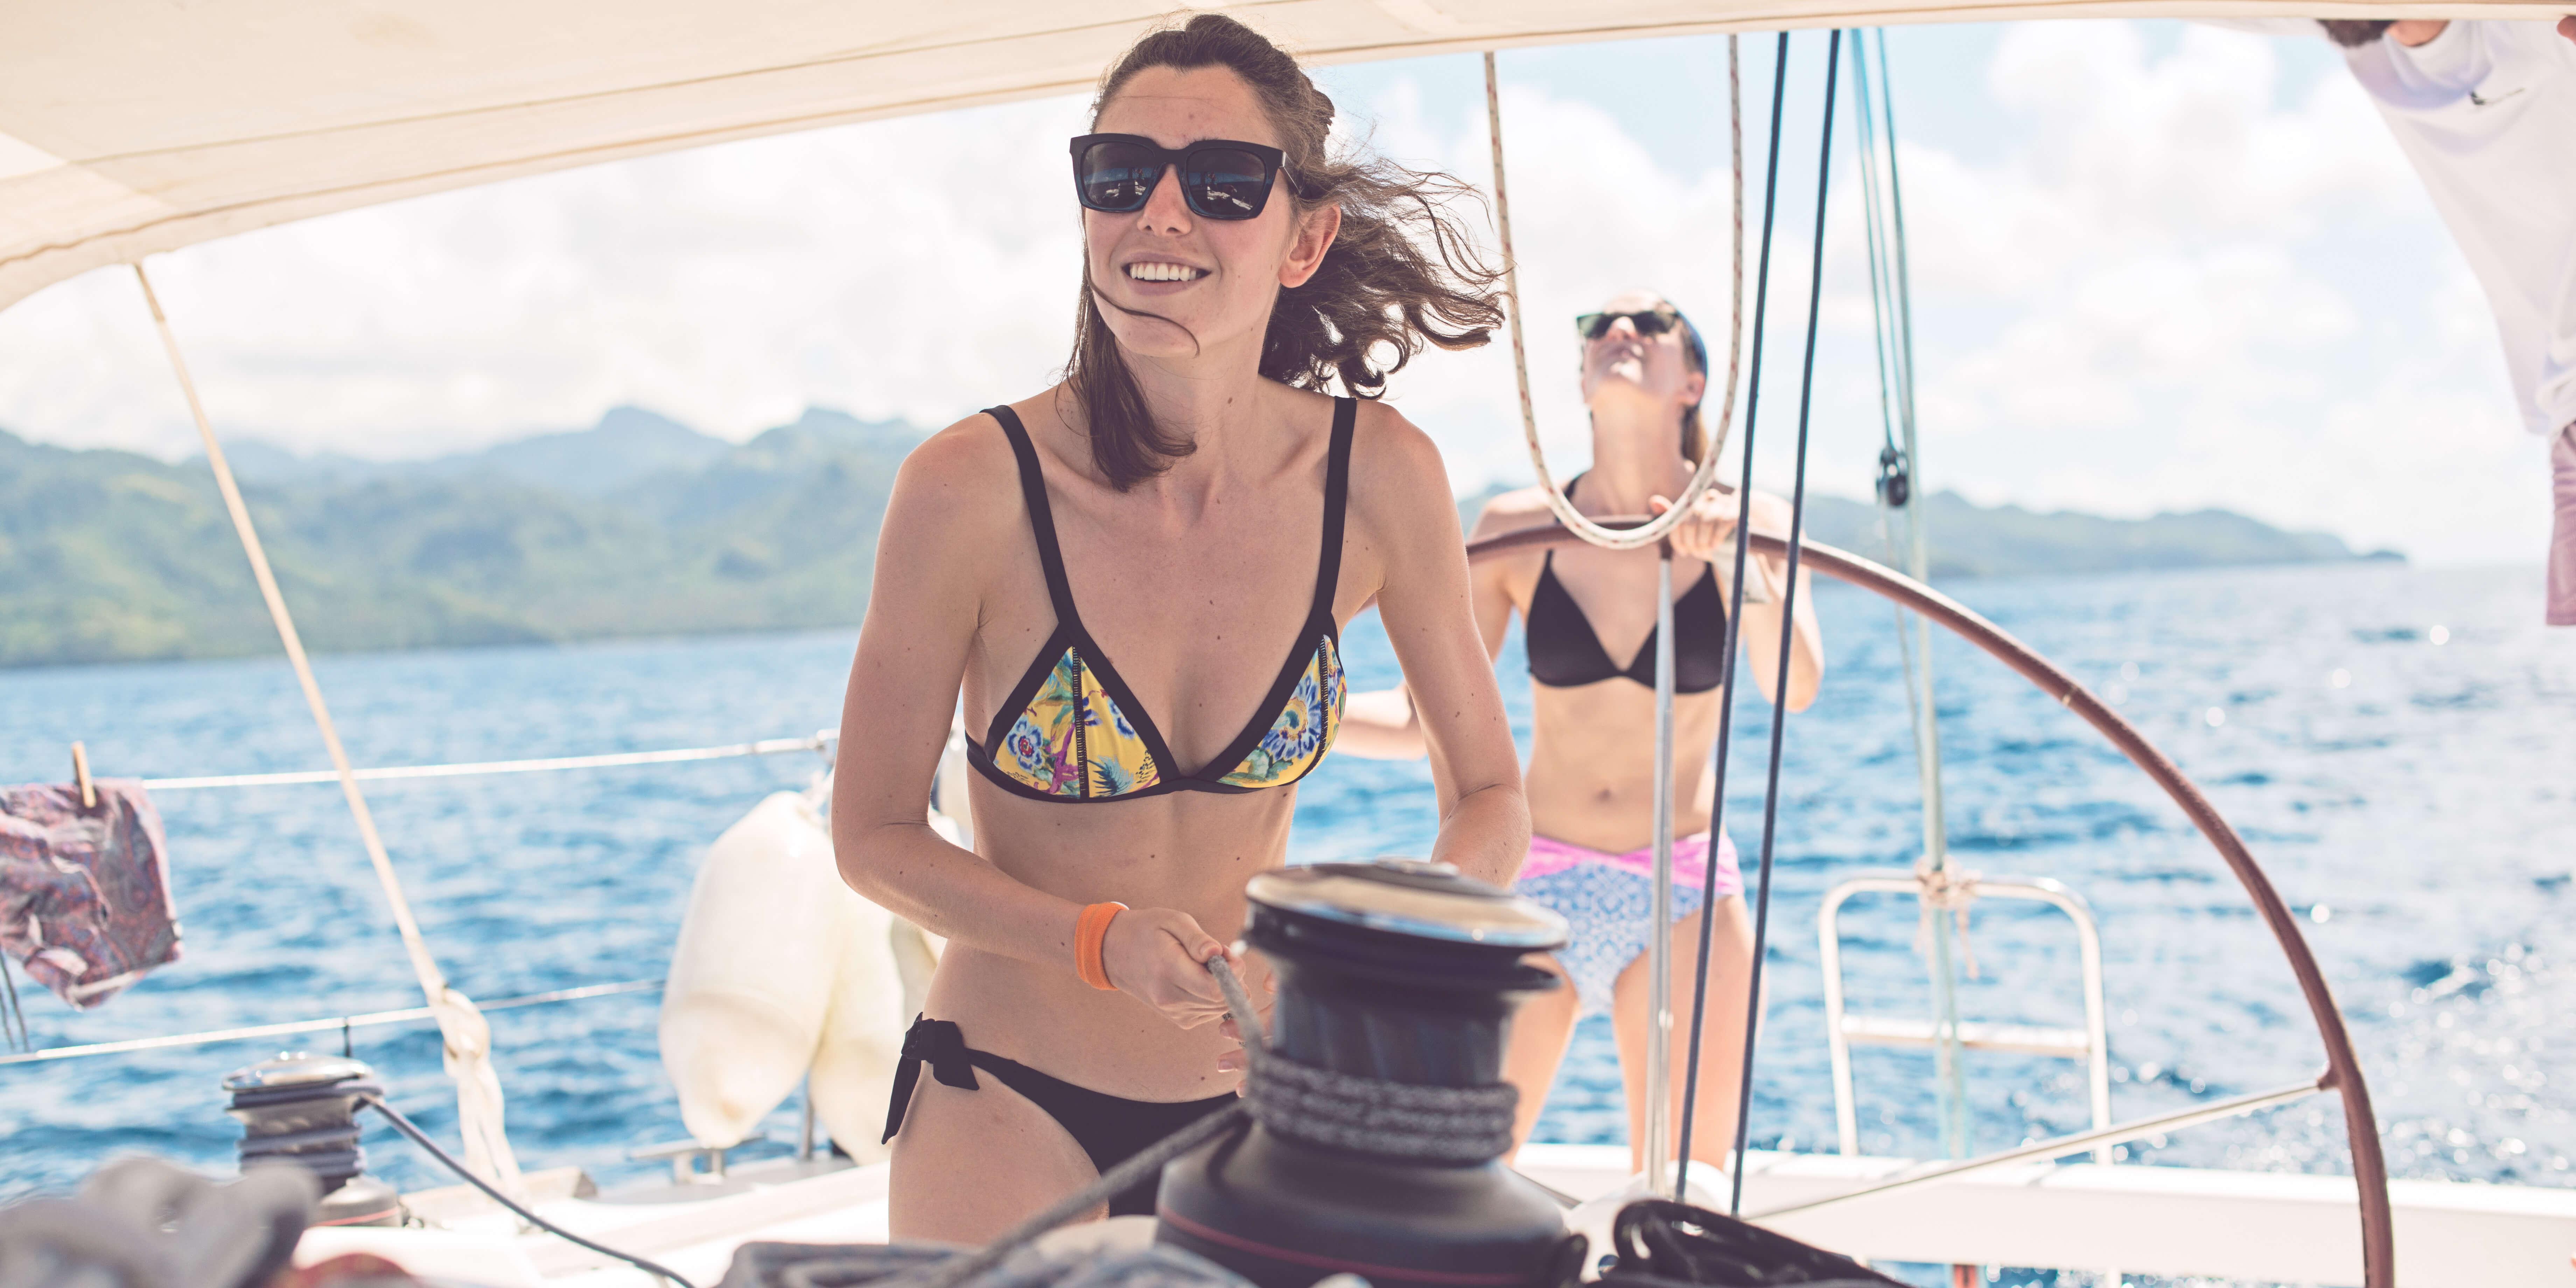 New skills from sailing